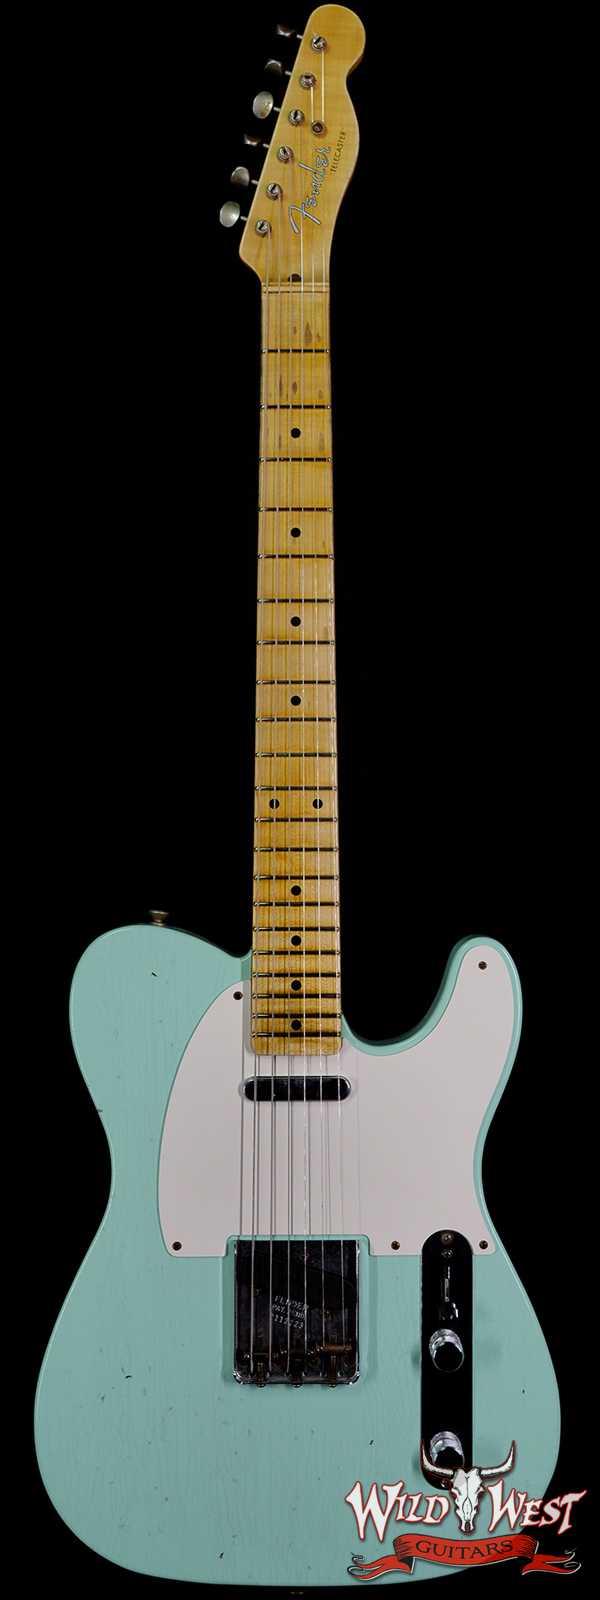 Fender Custom Shop 1950's Telecaster Hand-Wound Pickups Journeyman Relic Surf Green